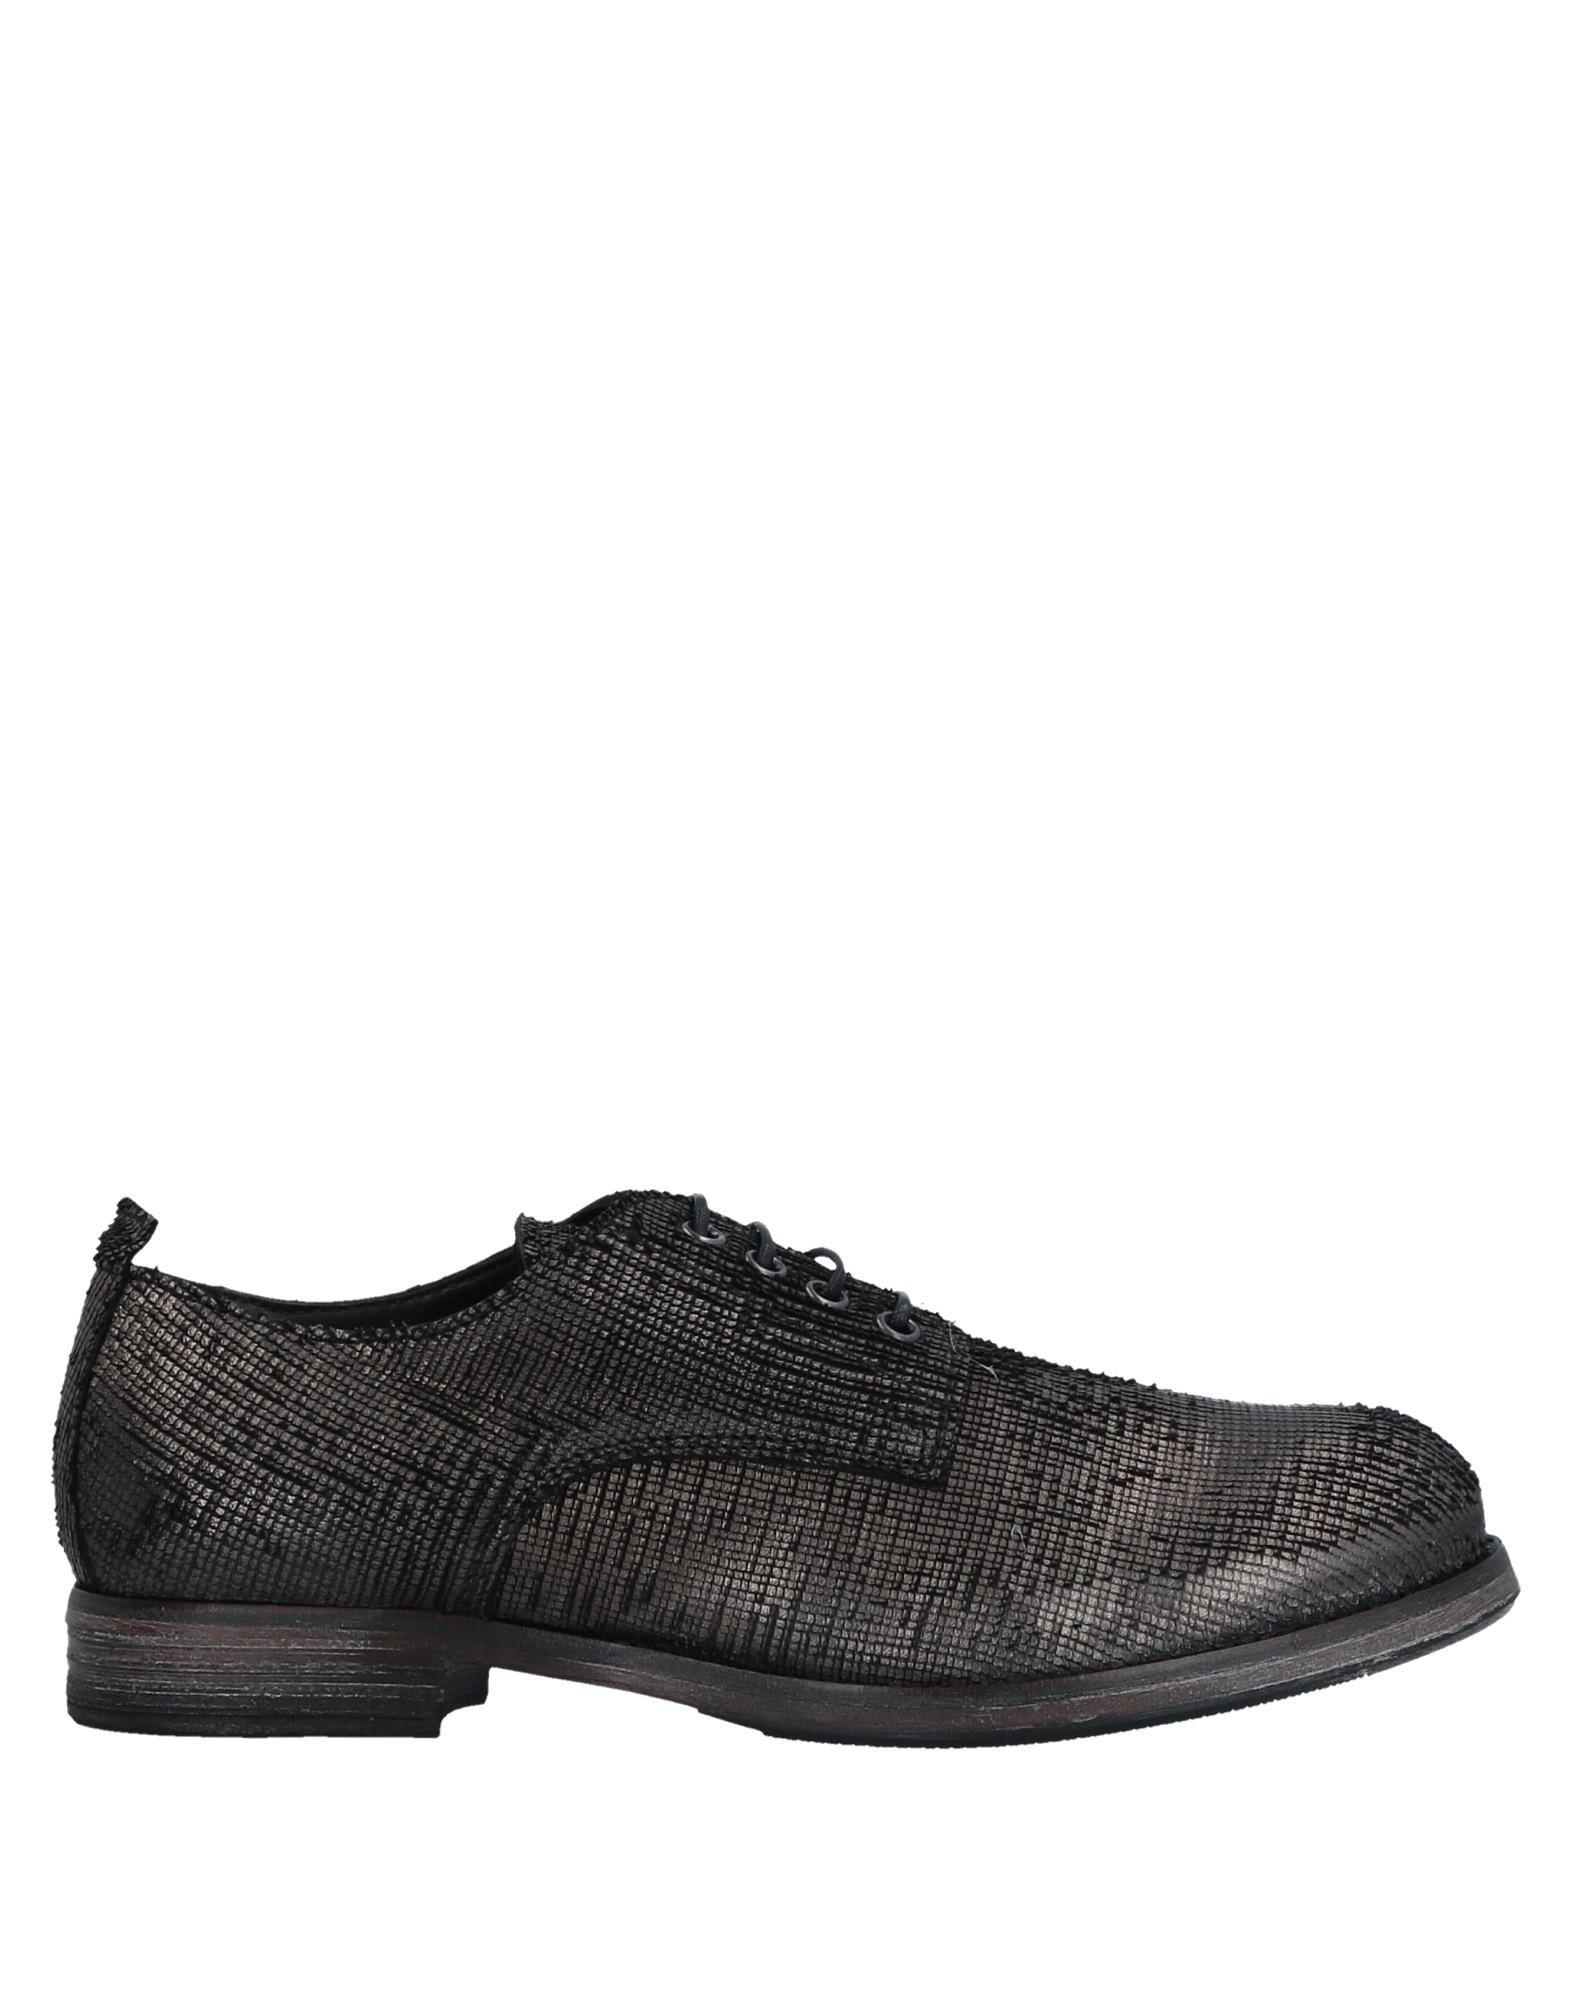 Moma Schnürschuhe Damen  11516652XV Gute Qualität beliebte Schuhe